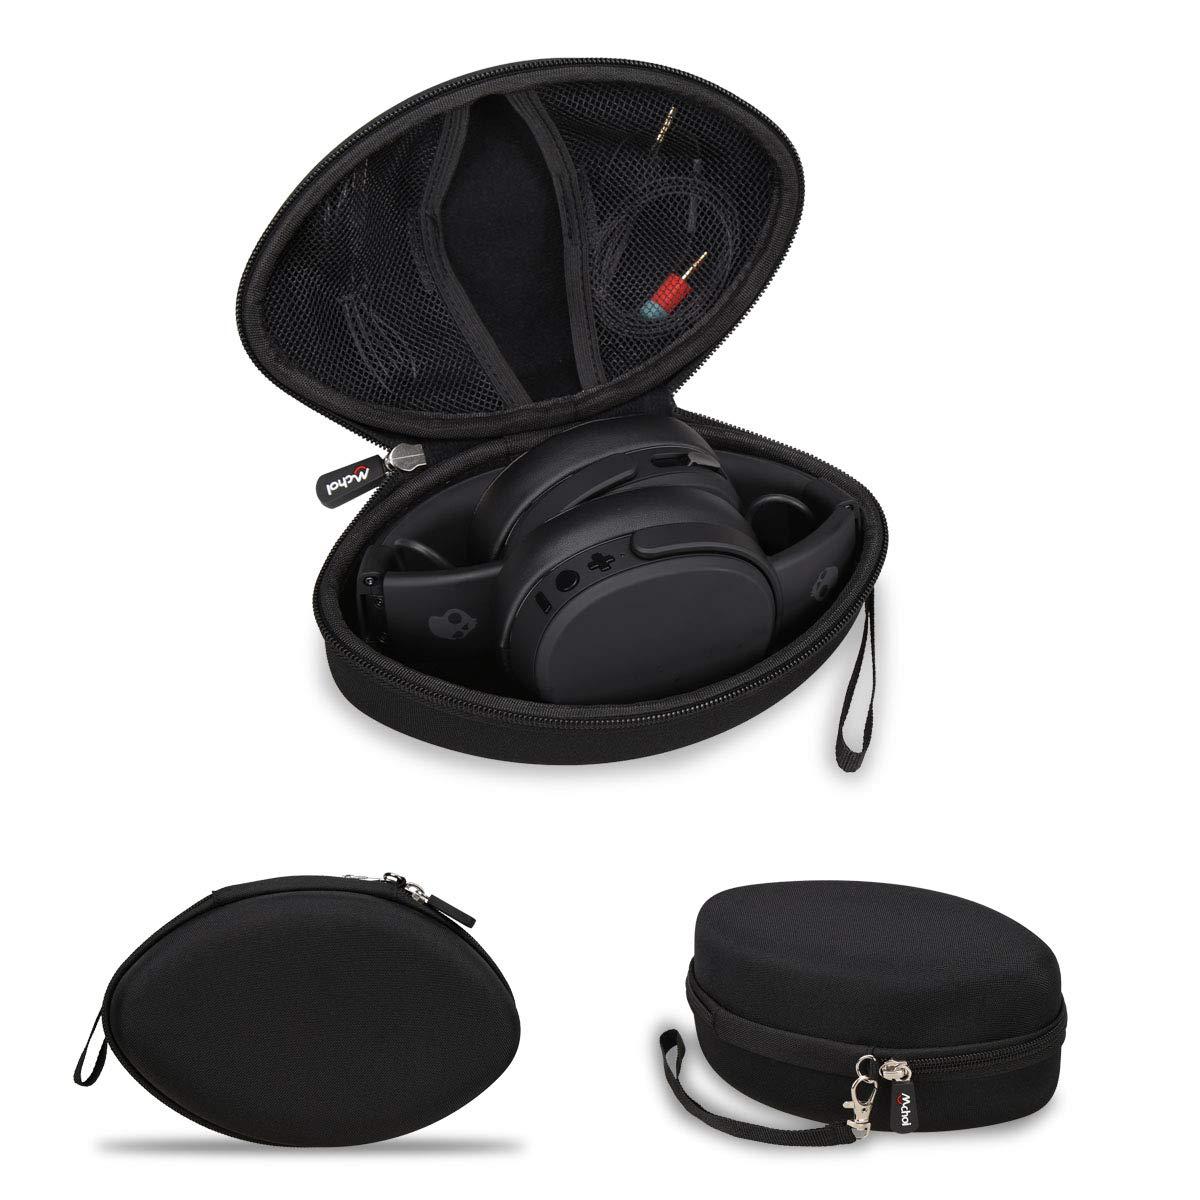 Mchoi ハードポータブルケース Skullcandy Crusherヘッドフォン用   B07PPN1JK2